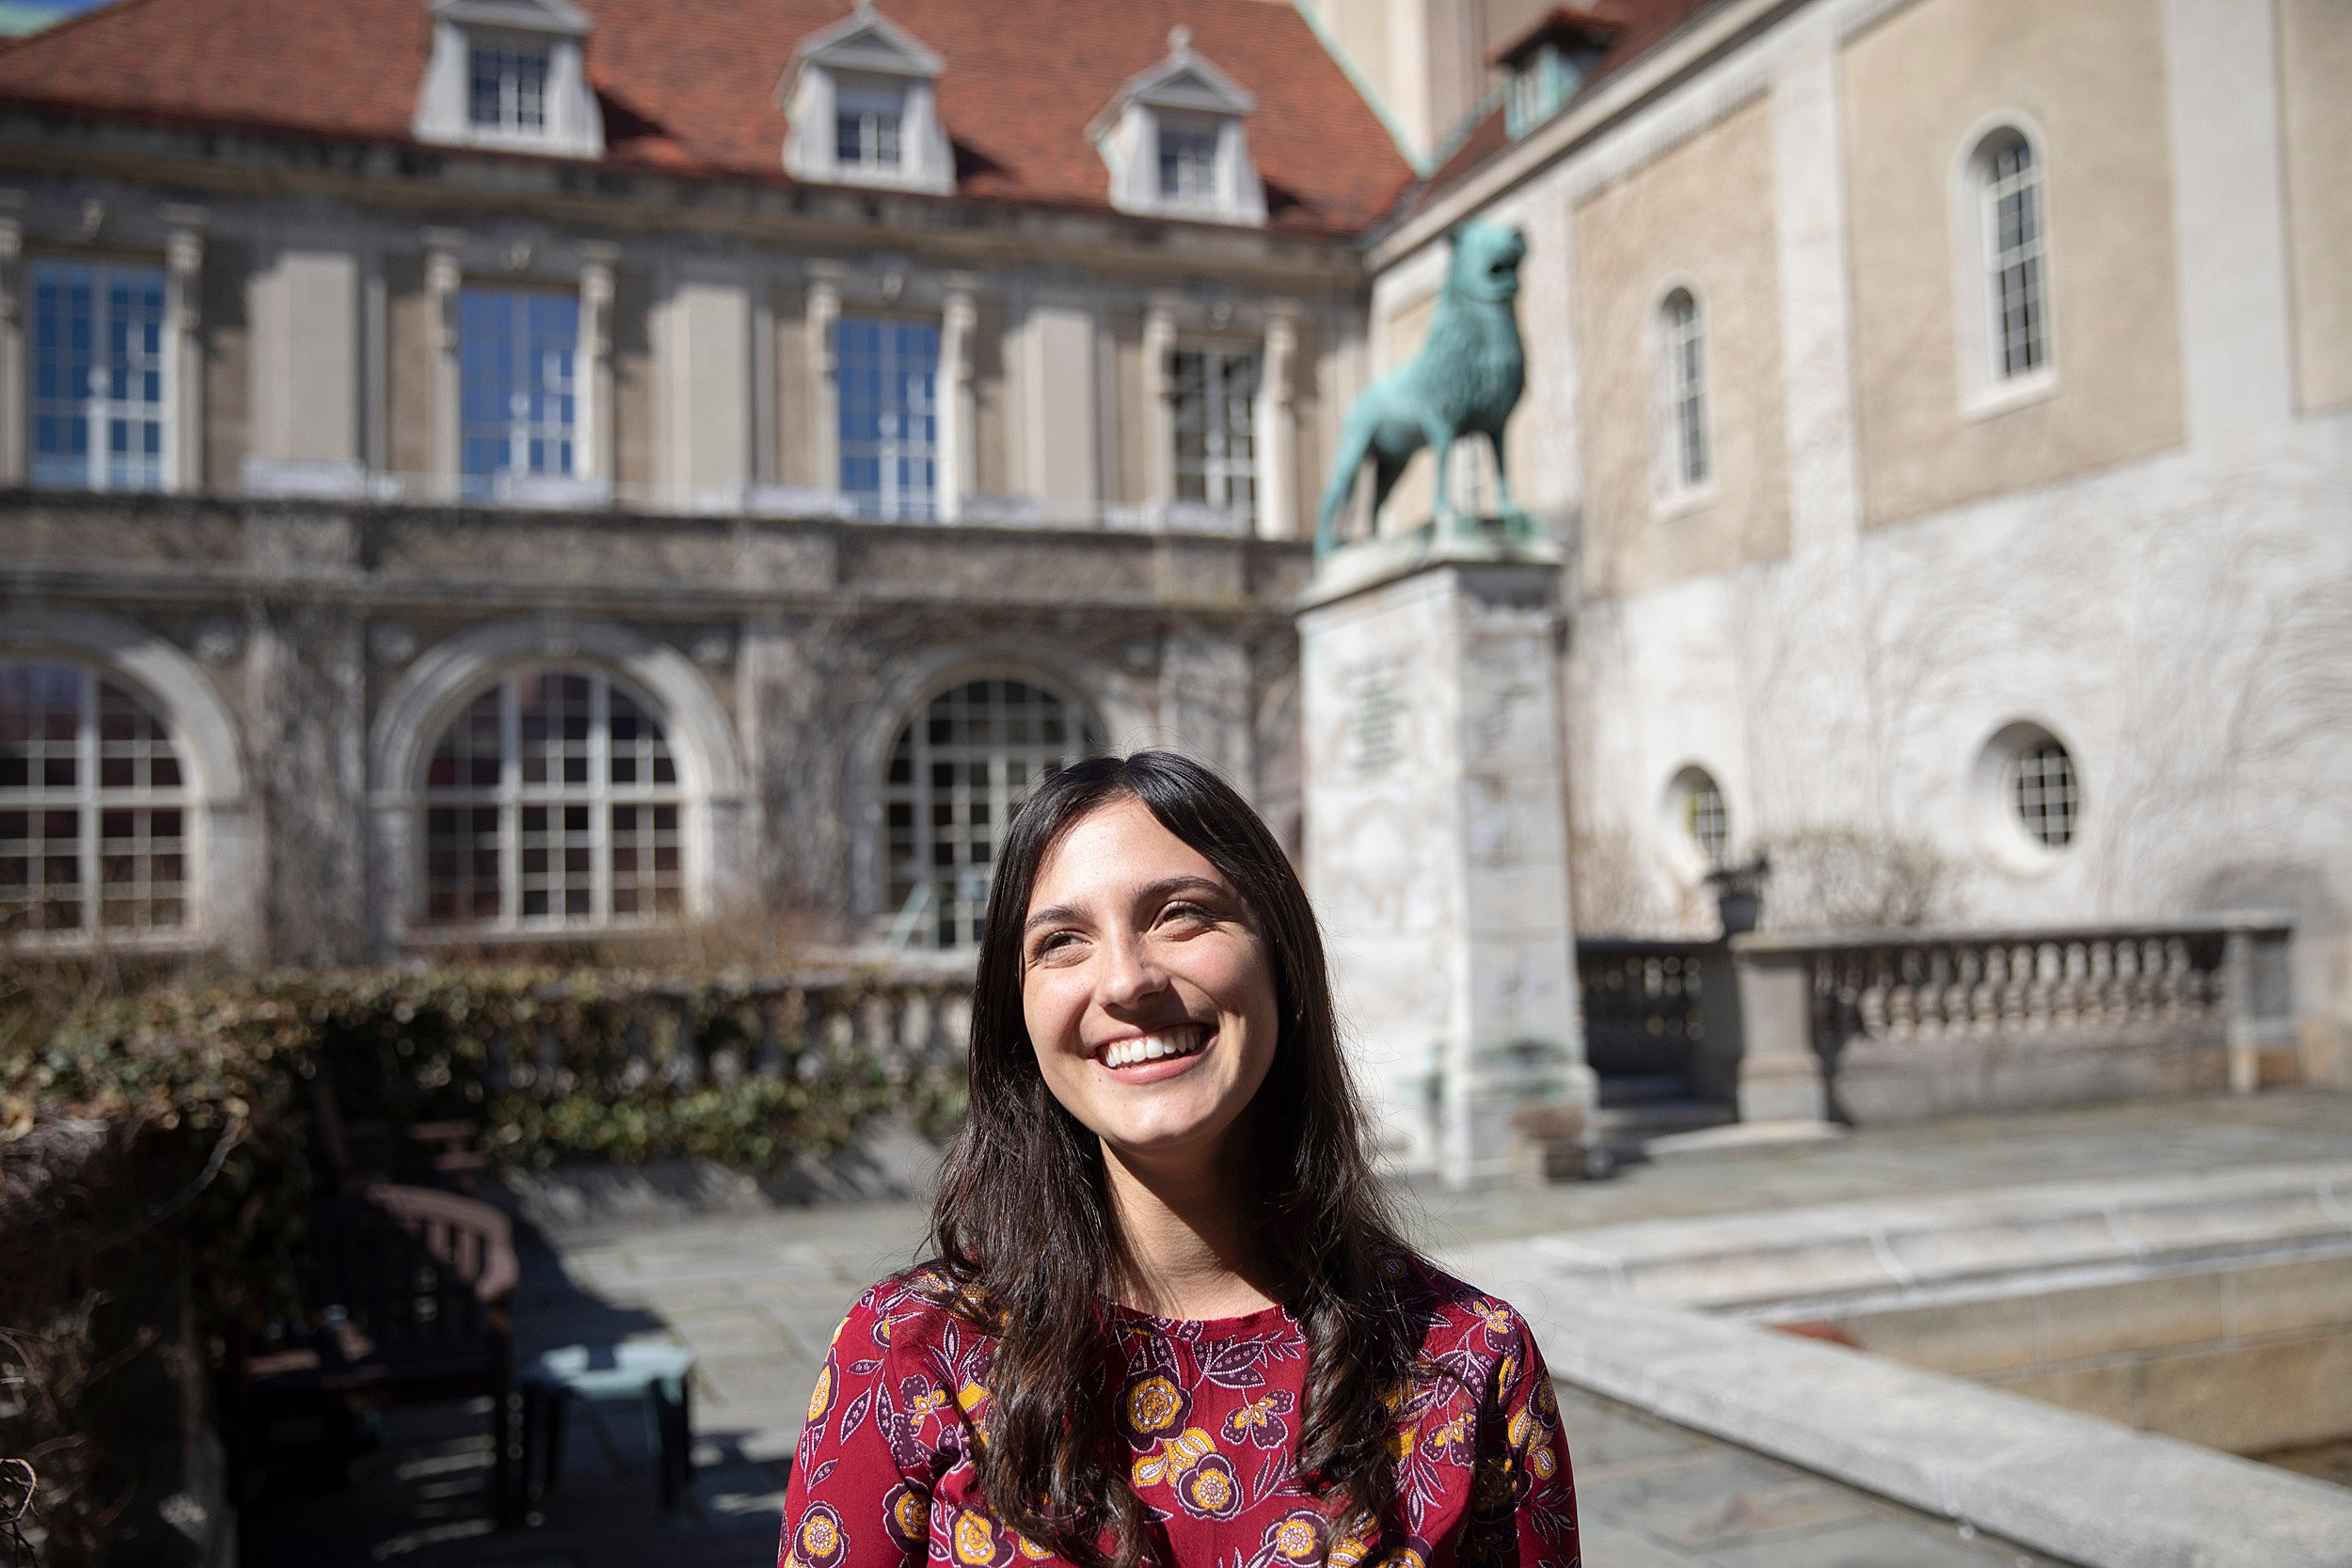 Sara Bobok '19 standing in a courtyard